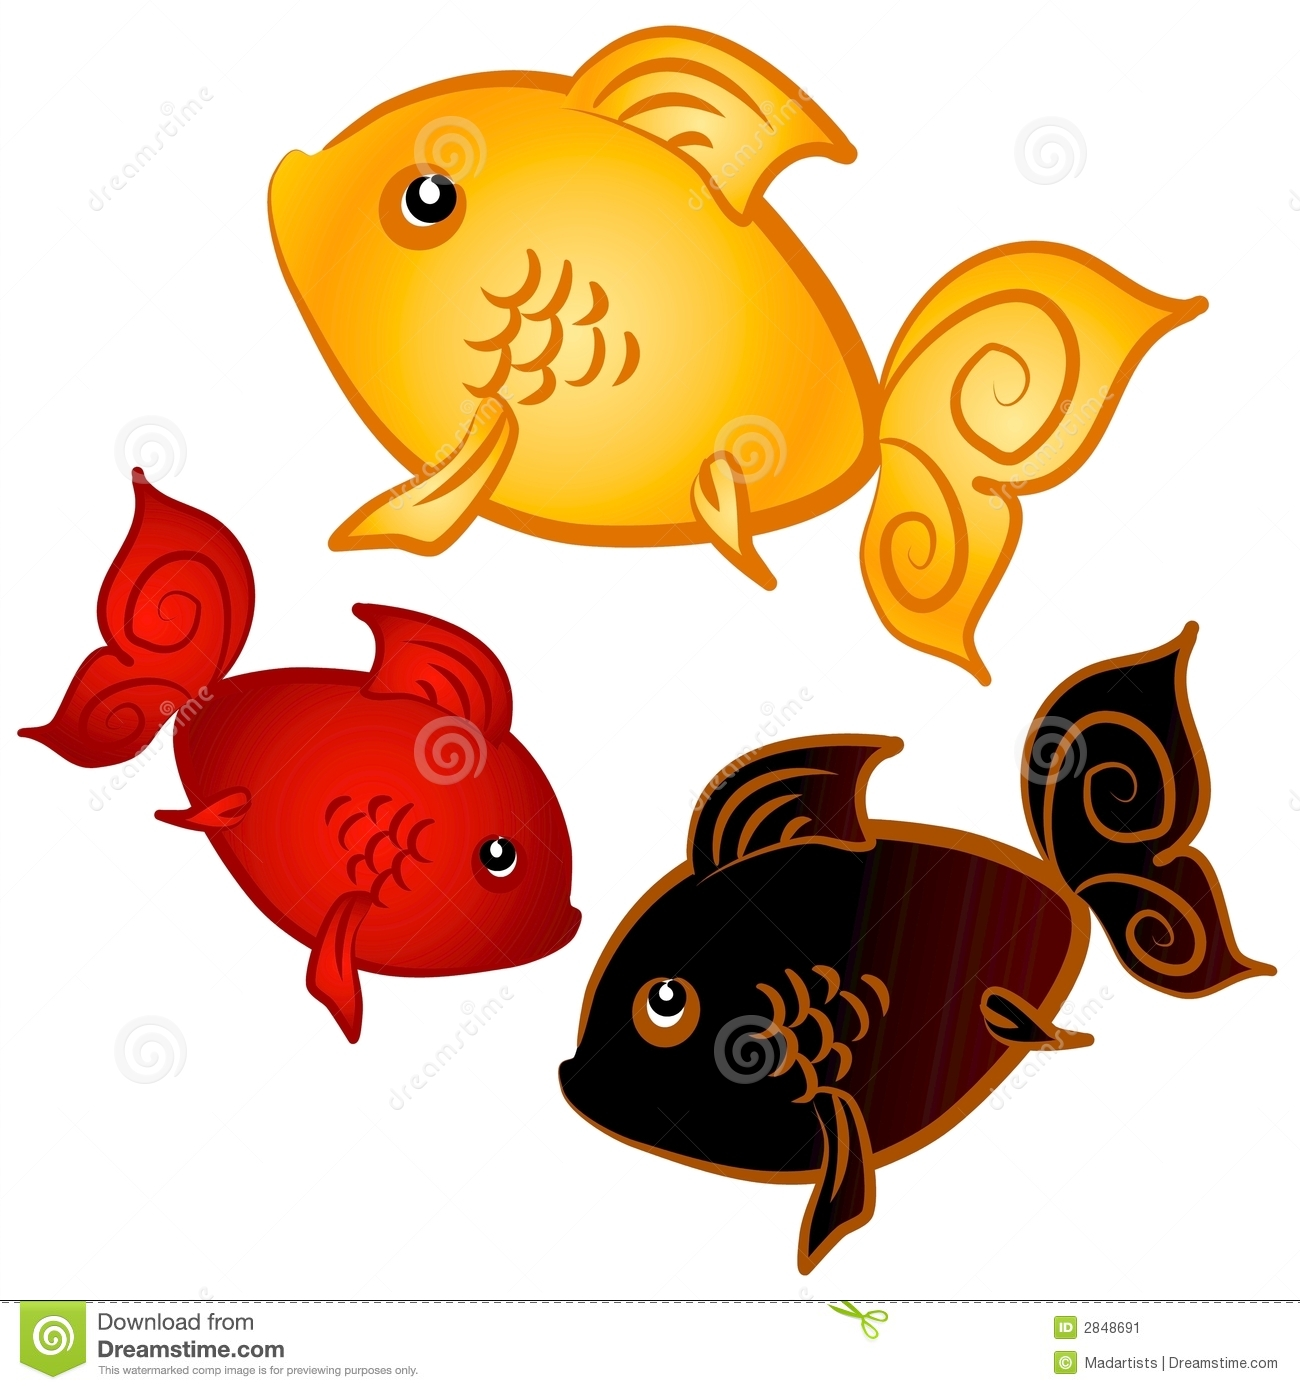 Goldfish clipart three. Panda free images